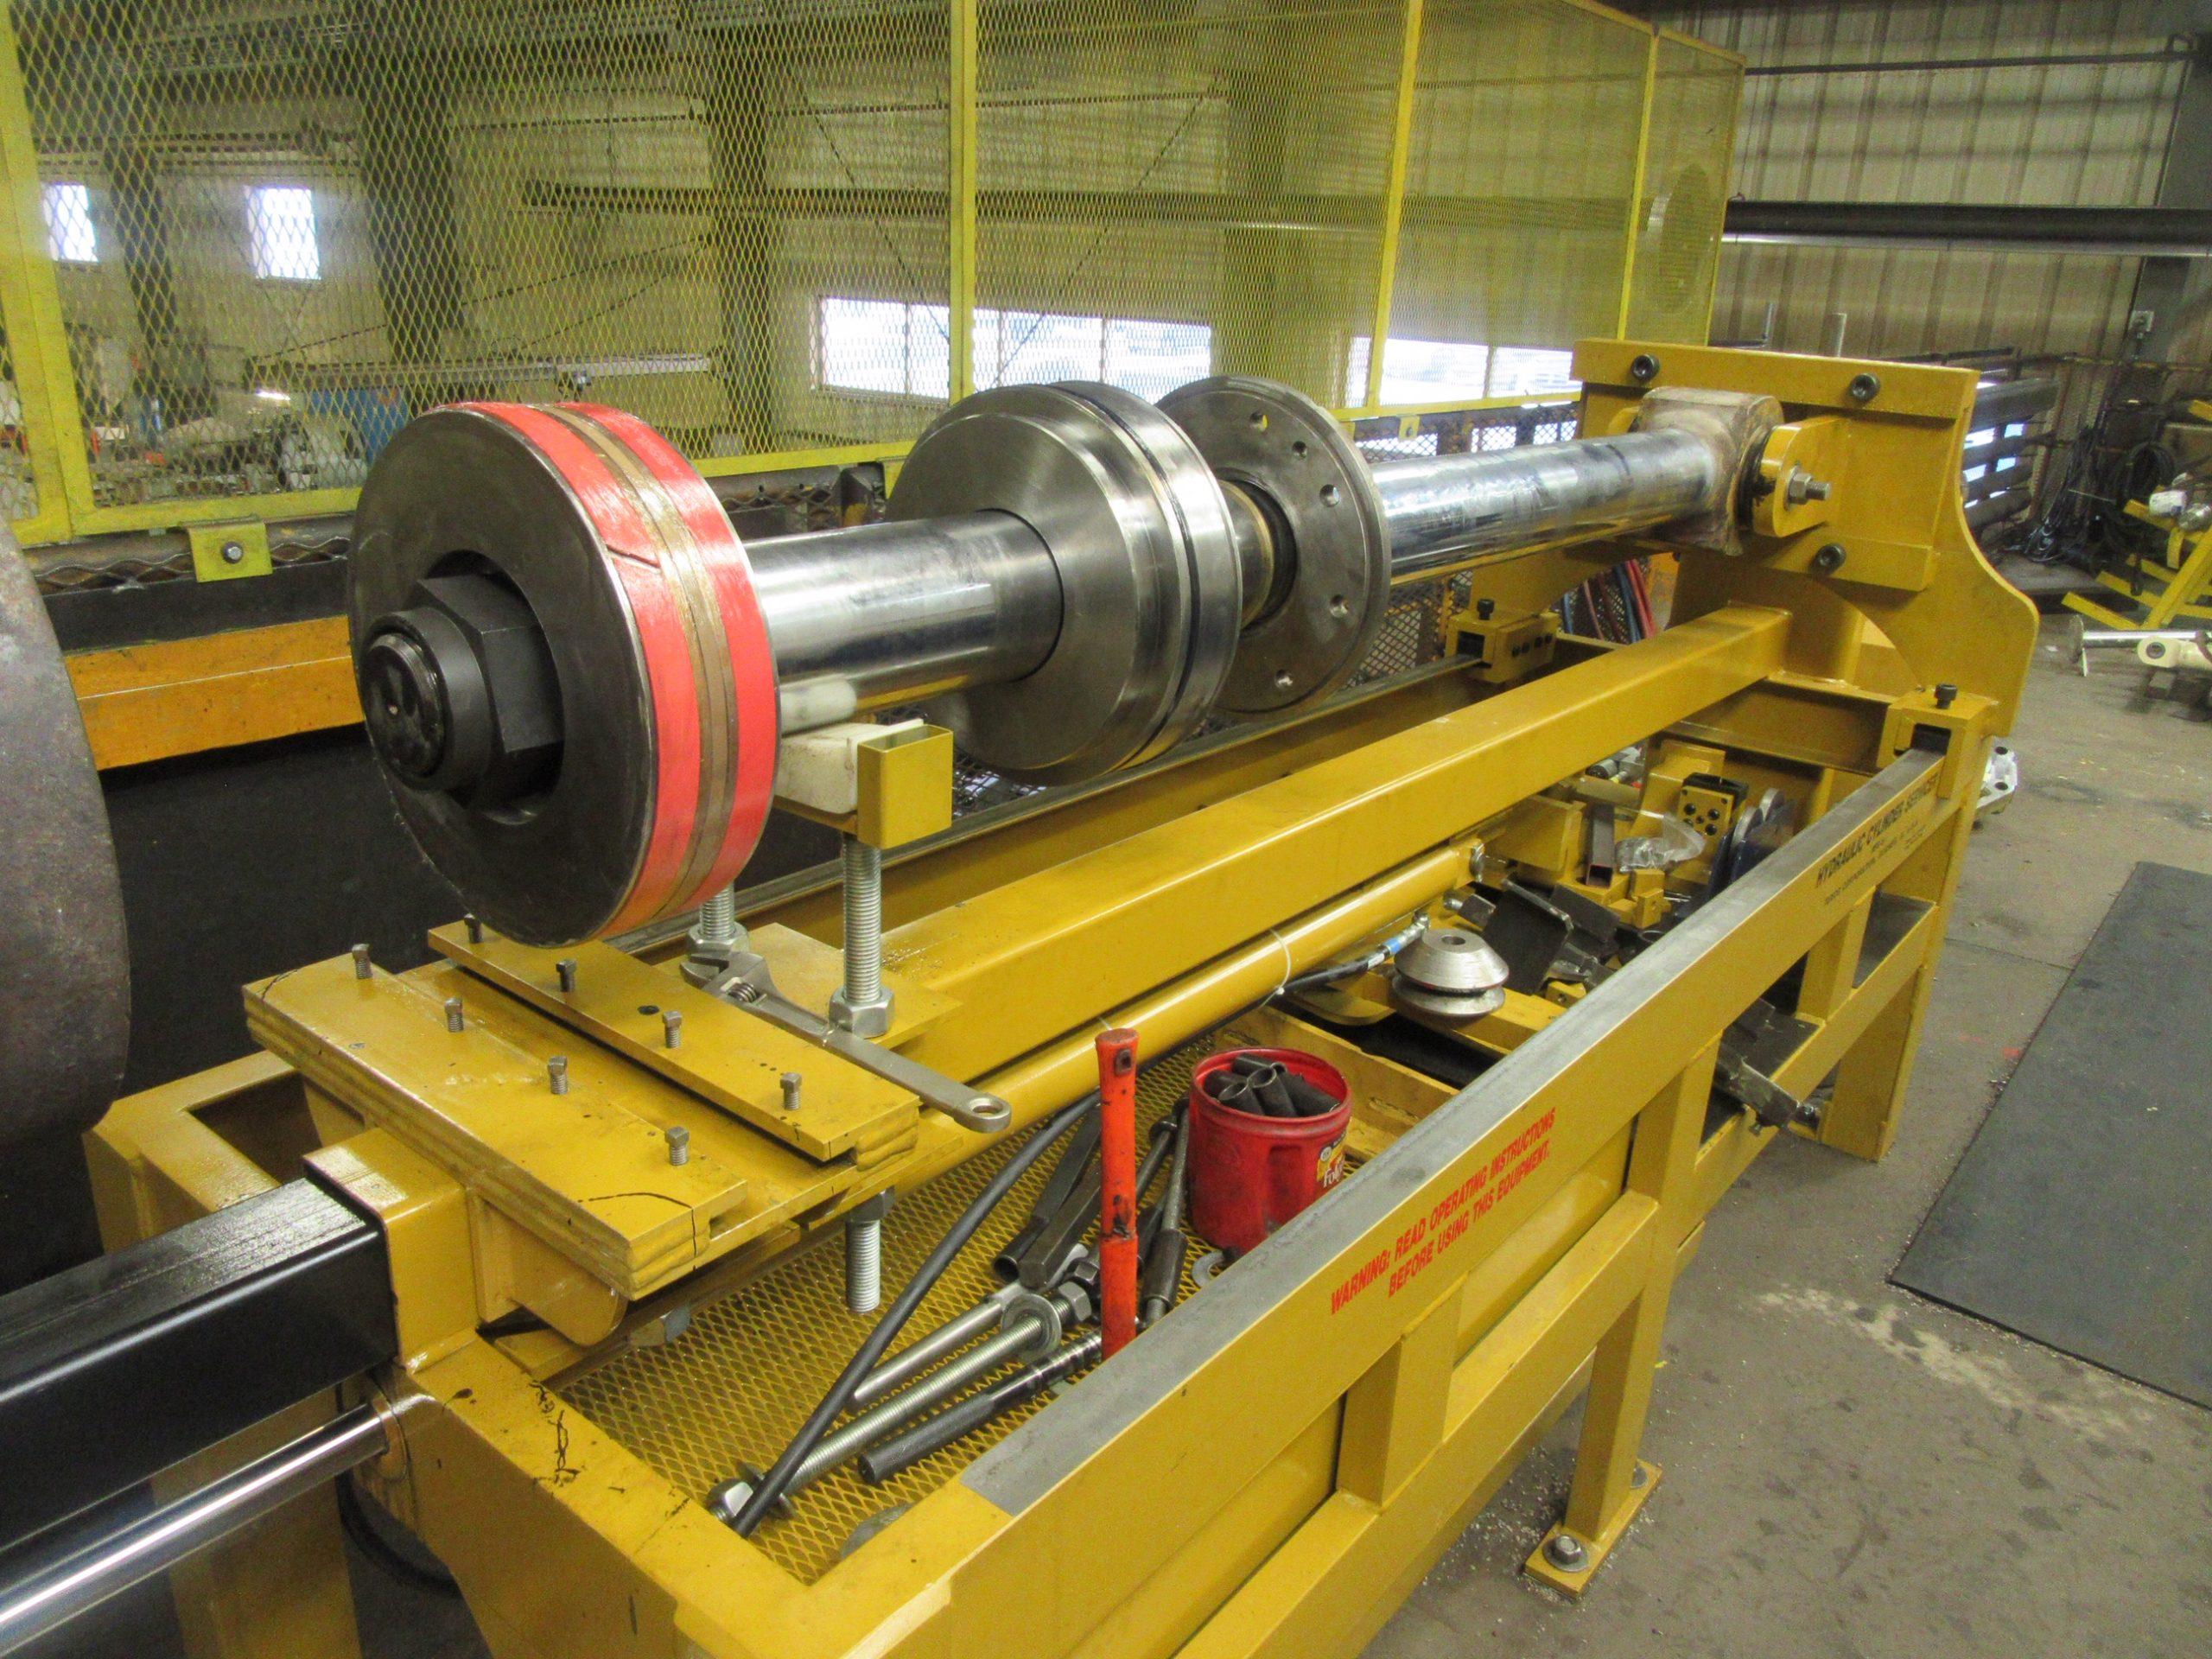 Hydraulic stripper use on pot hauler 12 inch cylinders